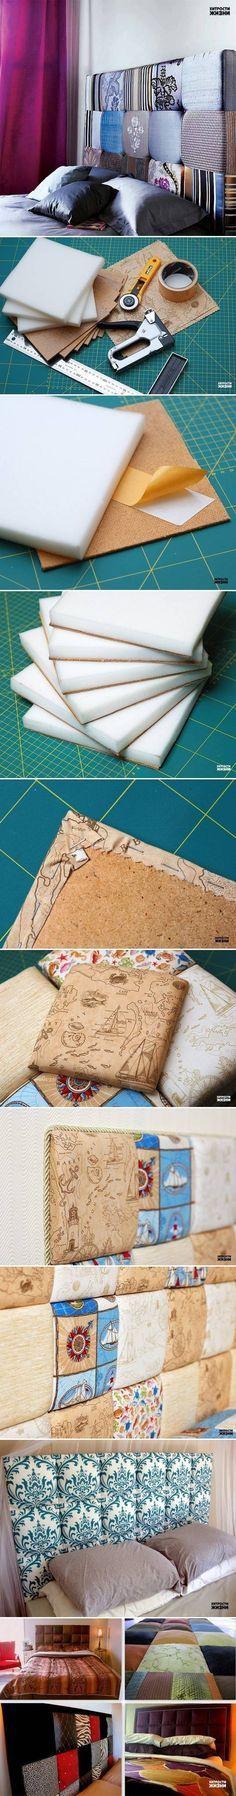 DIY Soft Cama Cabecera DIY Proyectos   UsefulDIY.com